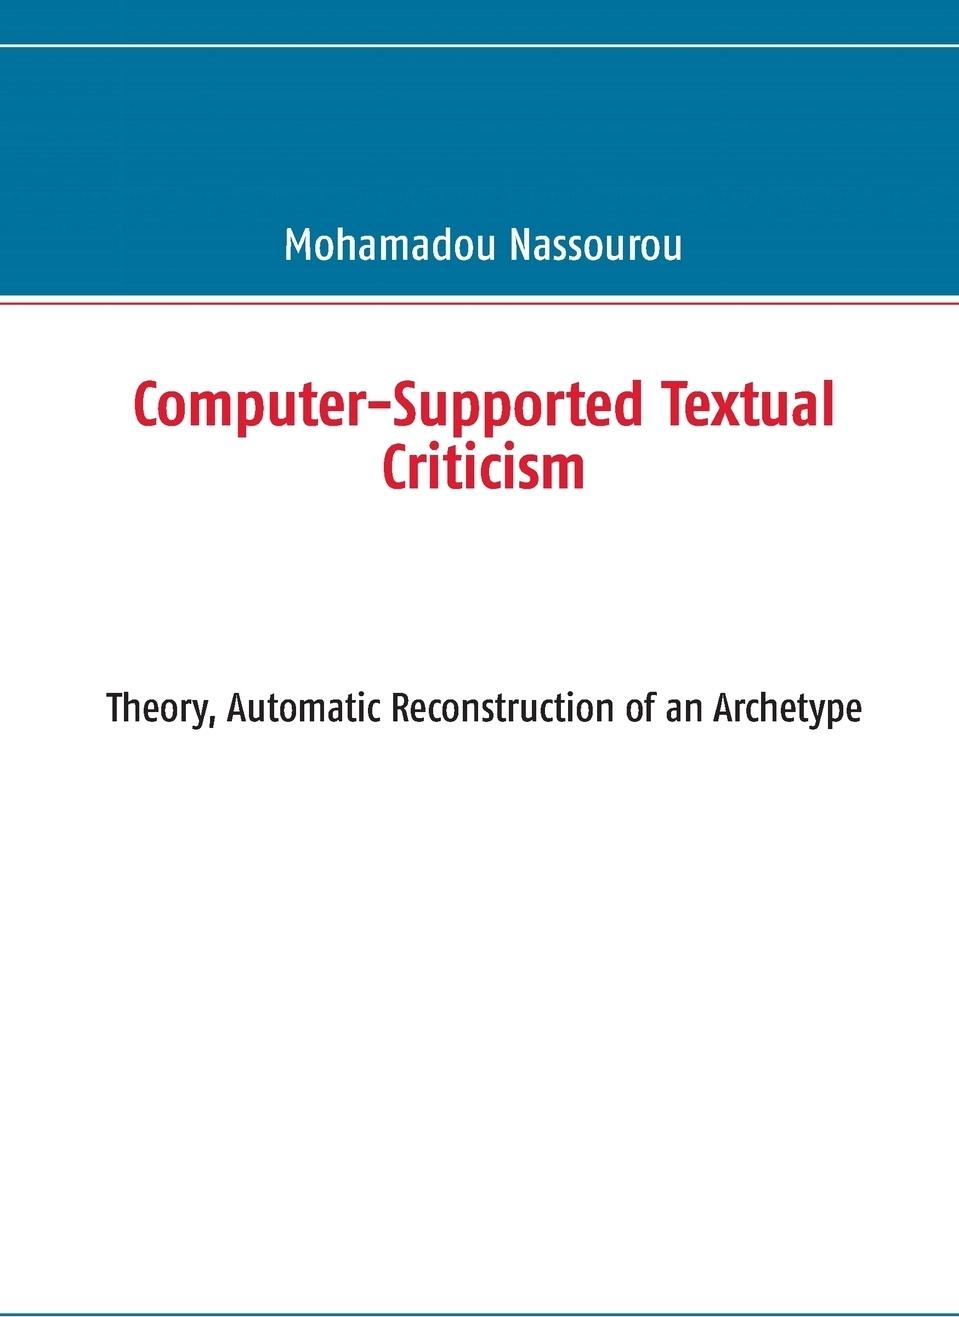 Mohamadou Nassourou. Computer-Supported Textual Criticism